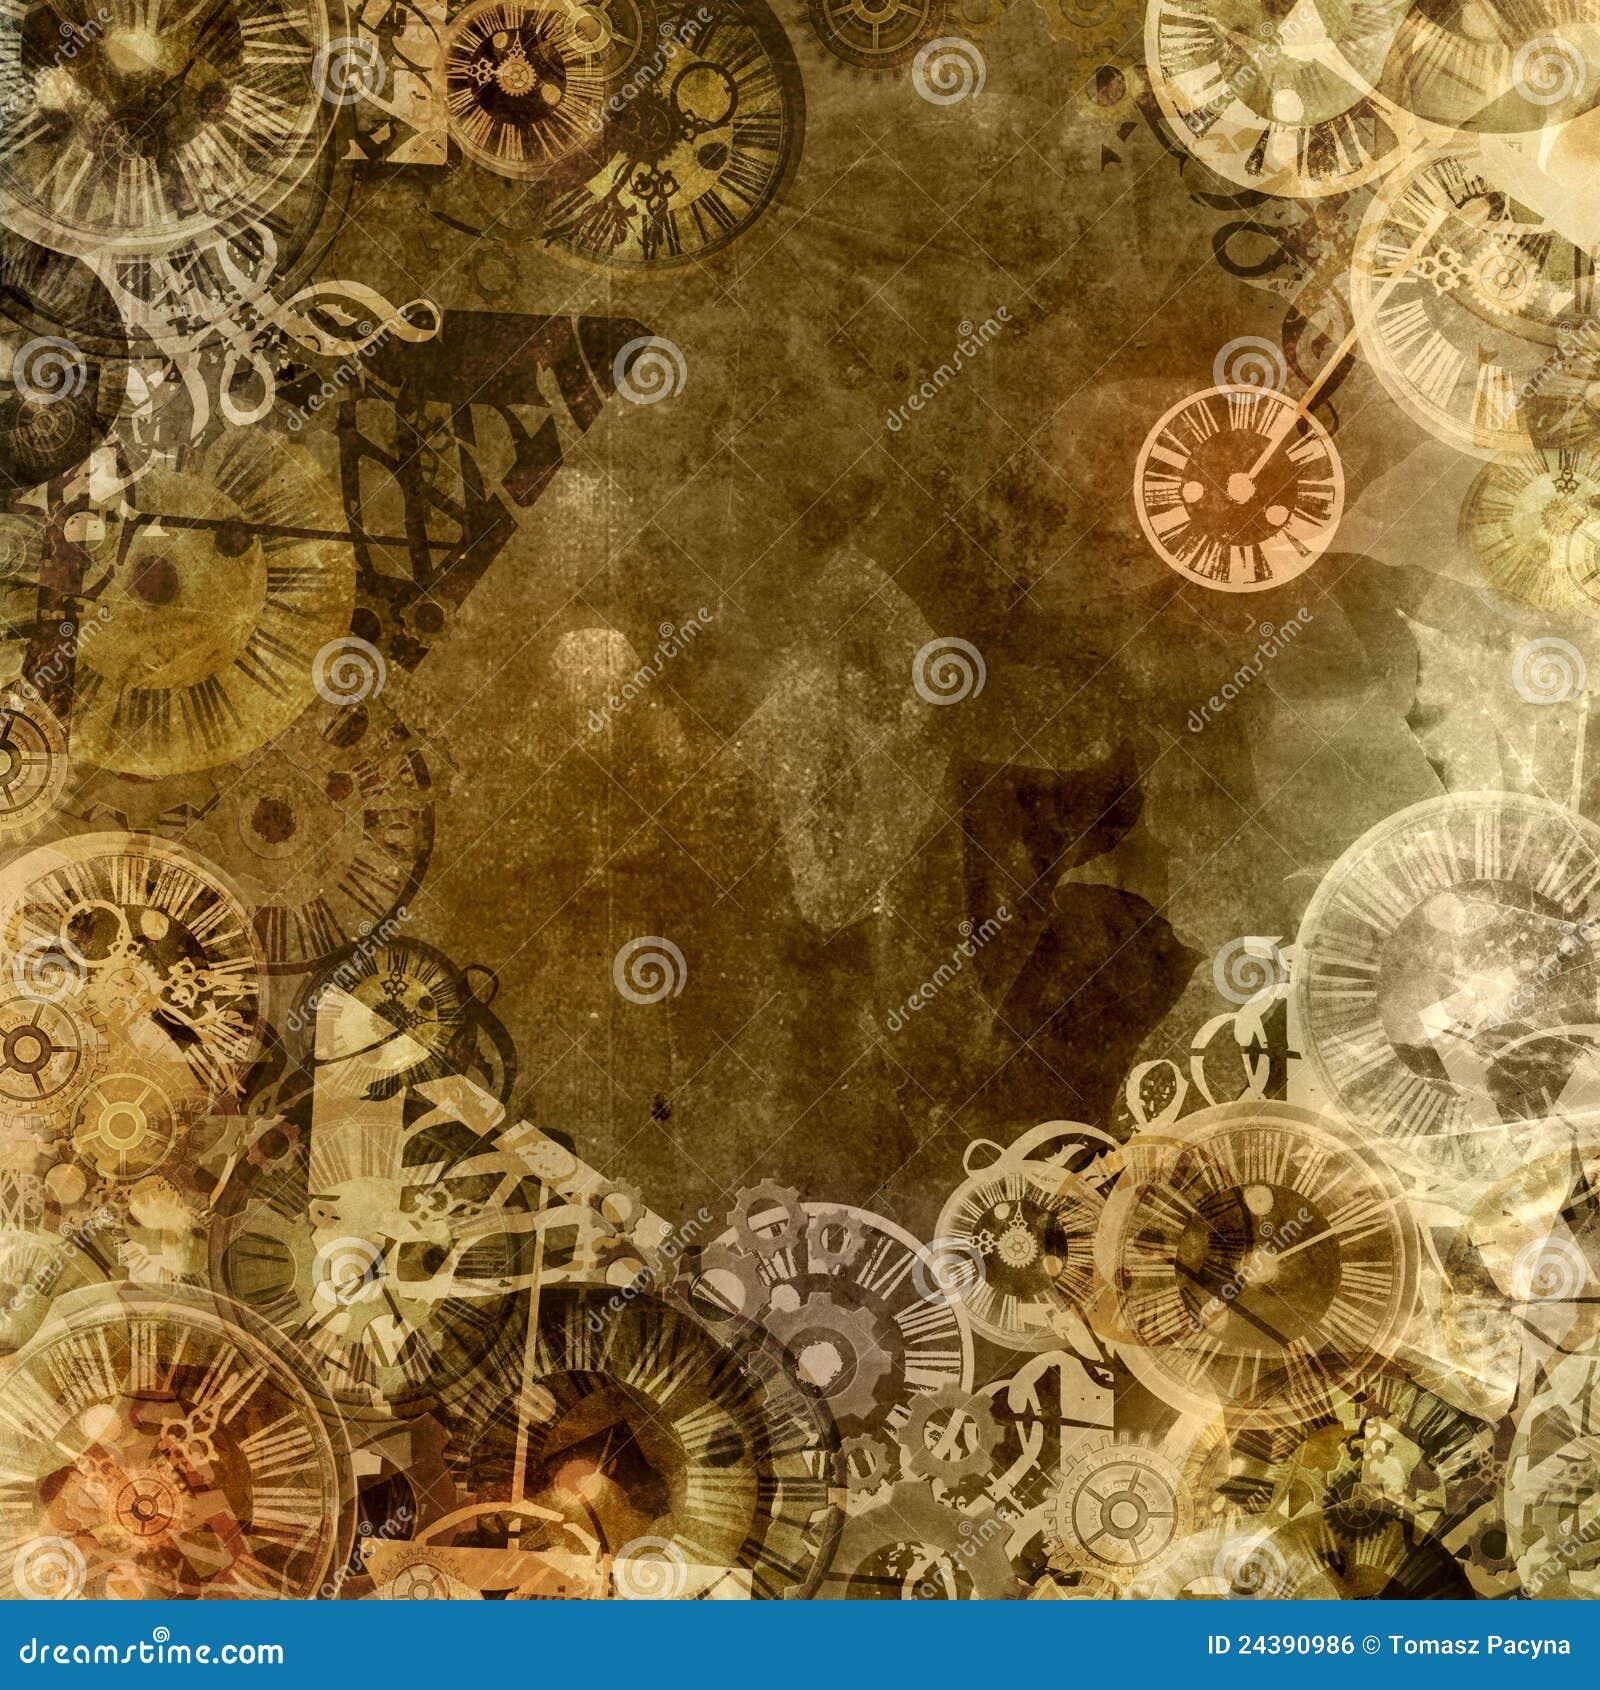 Vintage clocks time theme background